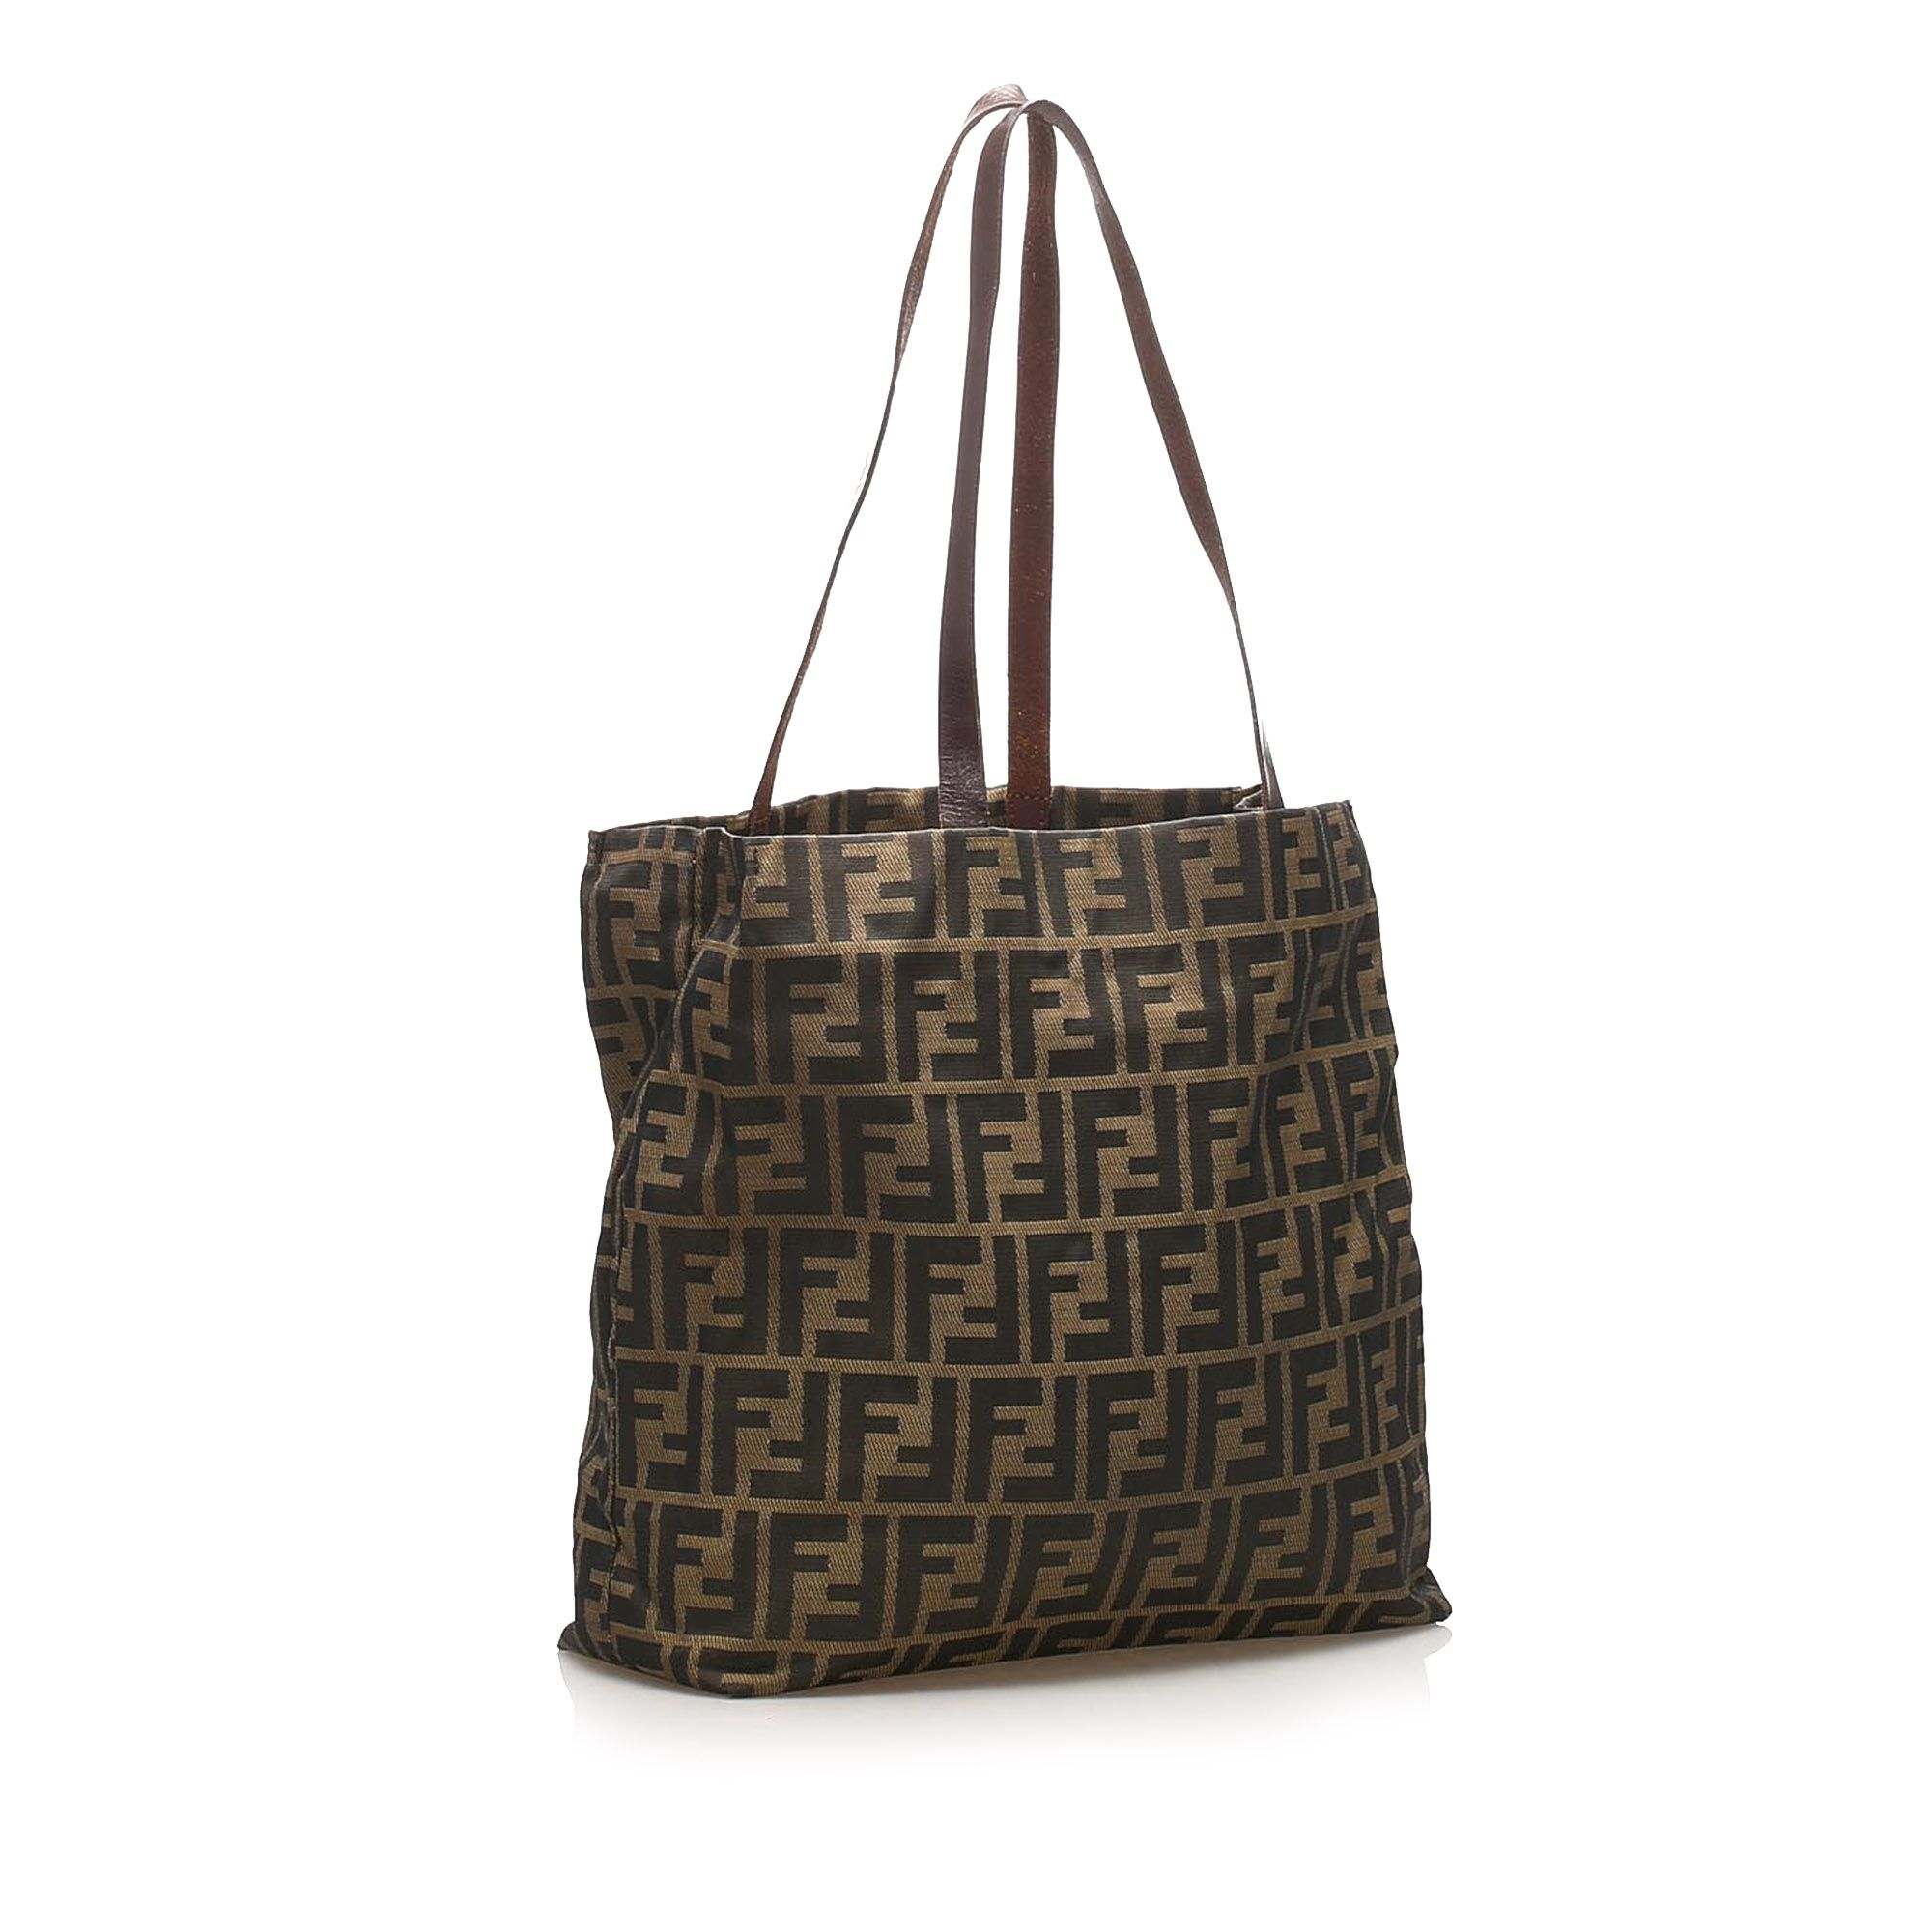 Vintage Fendi Zucca Nylon Tote Bag Black